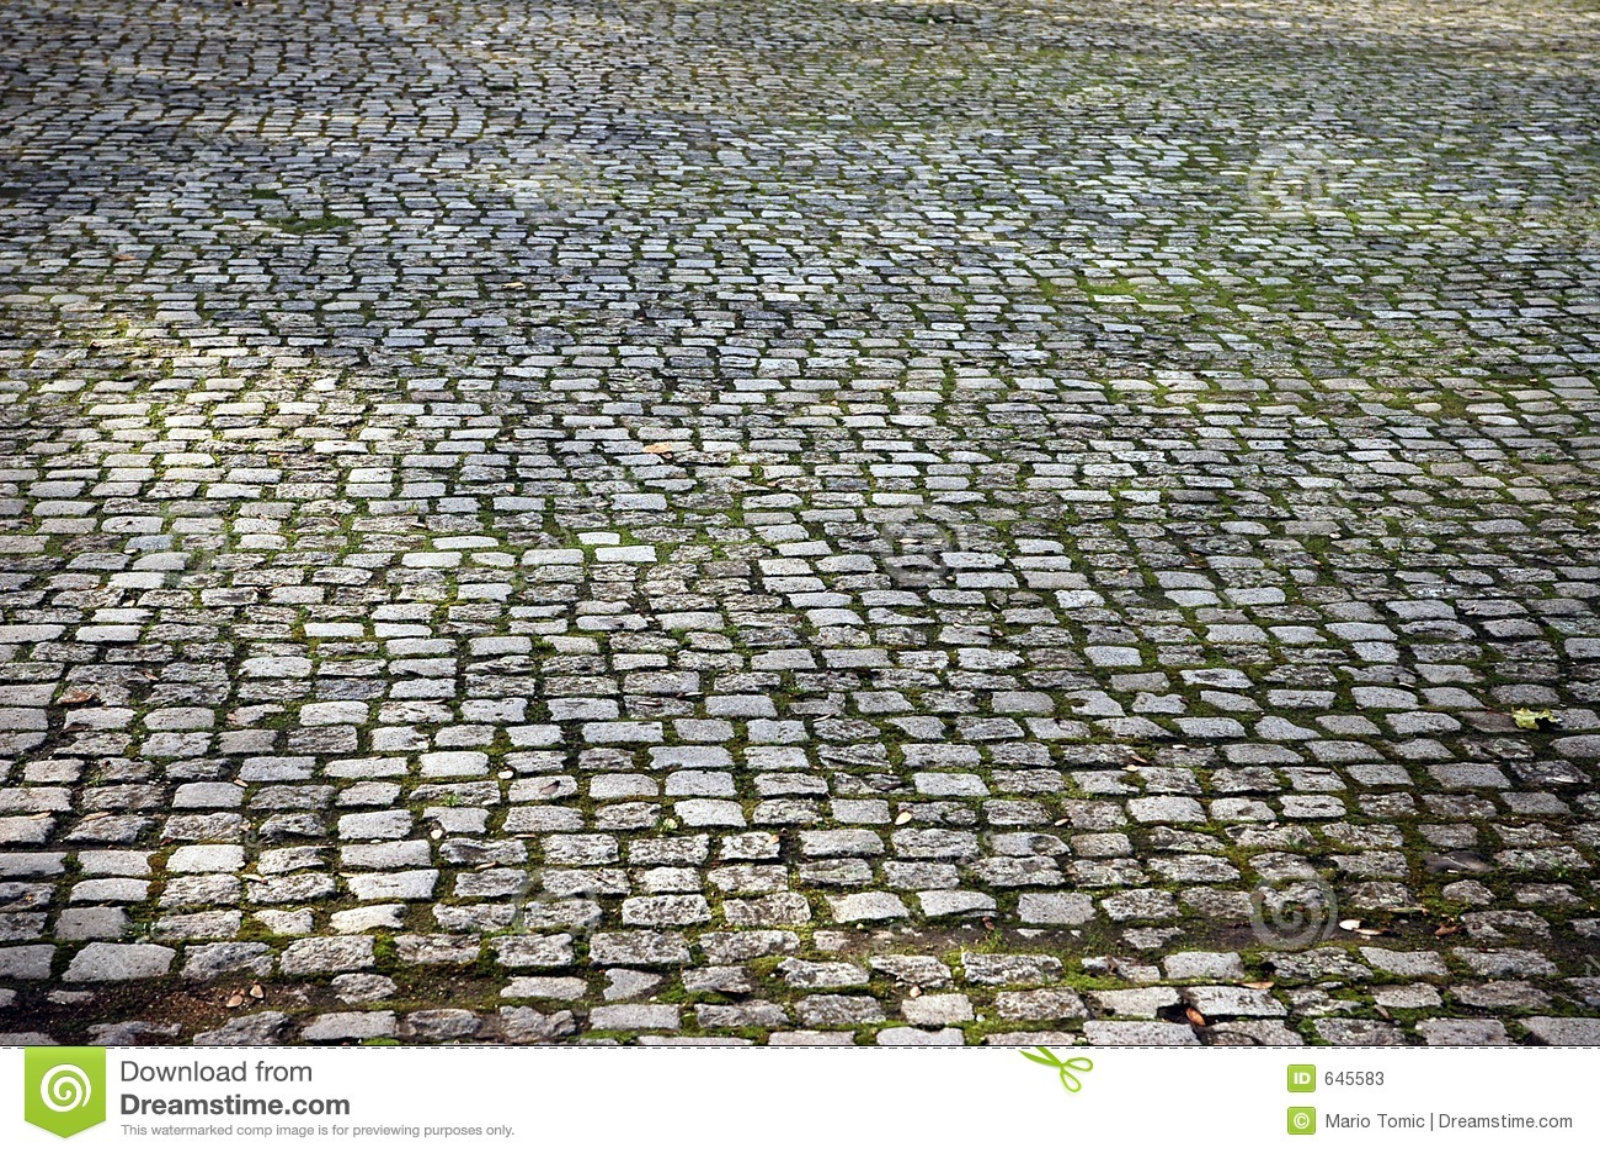 Brick Road Stock Photos - Image: 645583